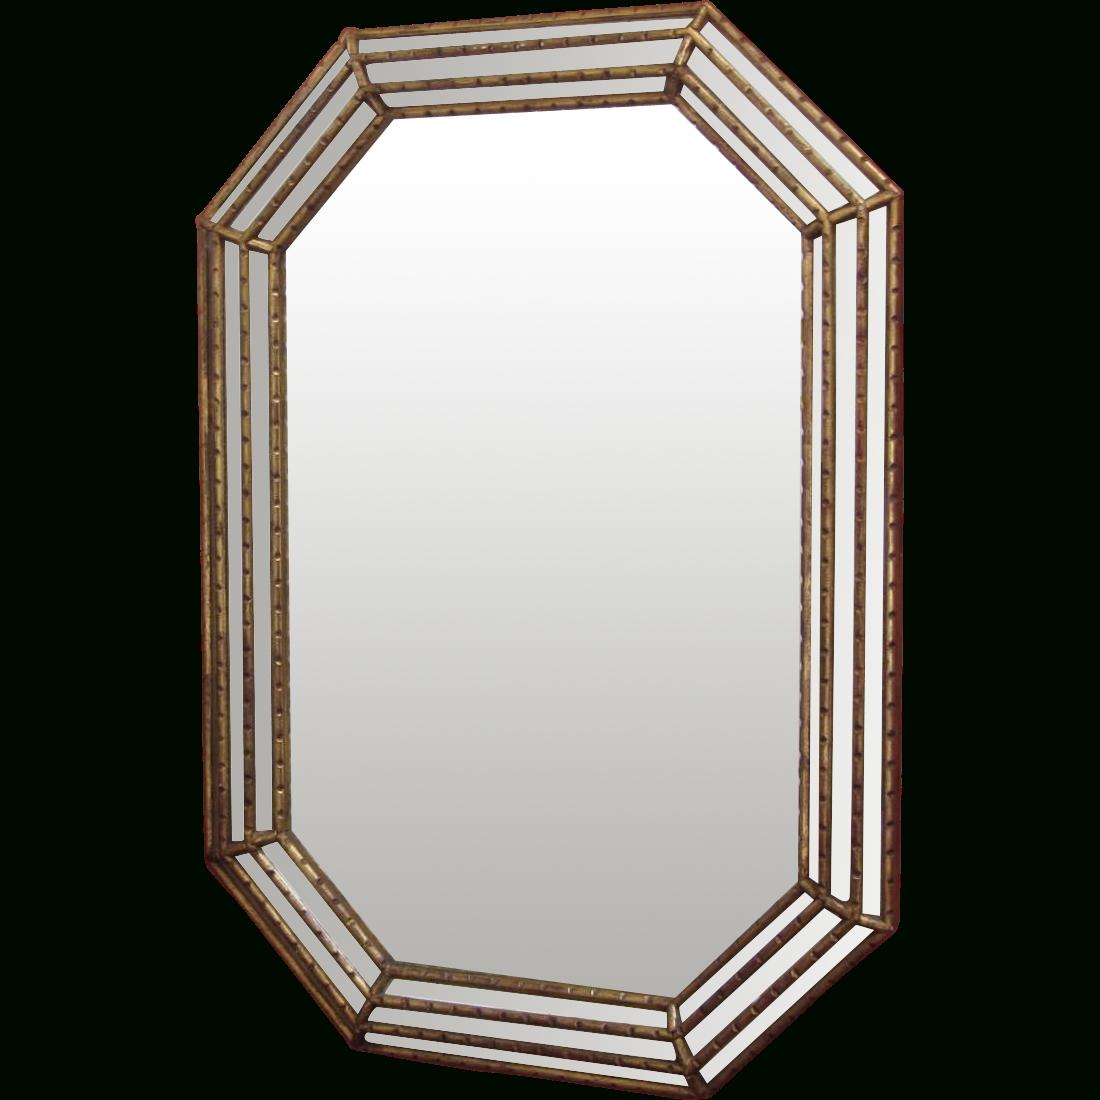 Platner Co Maverick Wall Mirror Accessories Mirrors Bronze Glass inside Bronze Starburst Mirrors (Image 21 of 25)